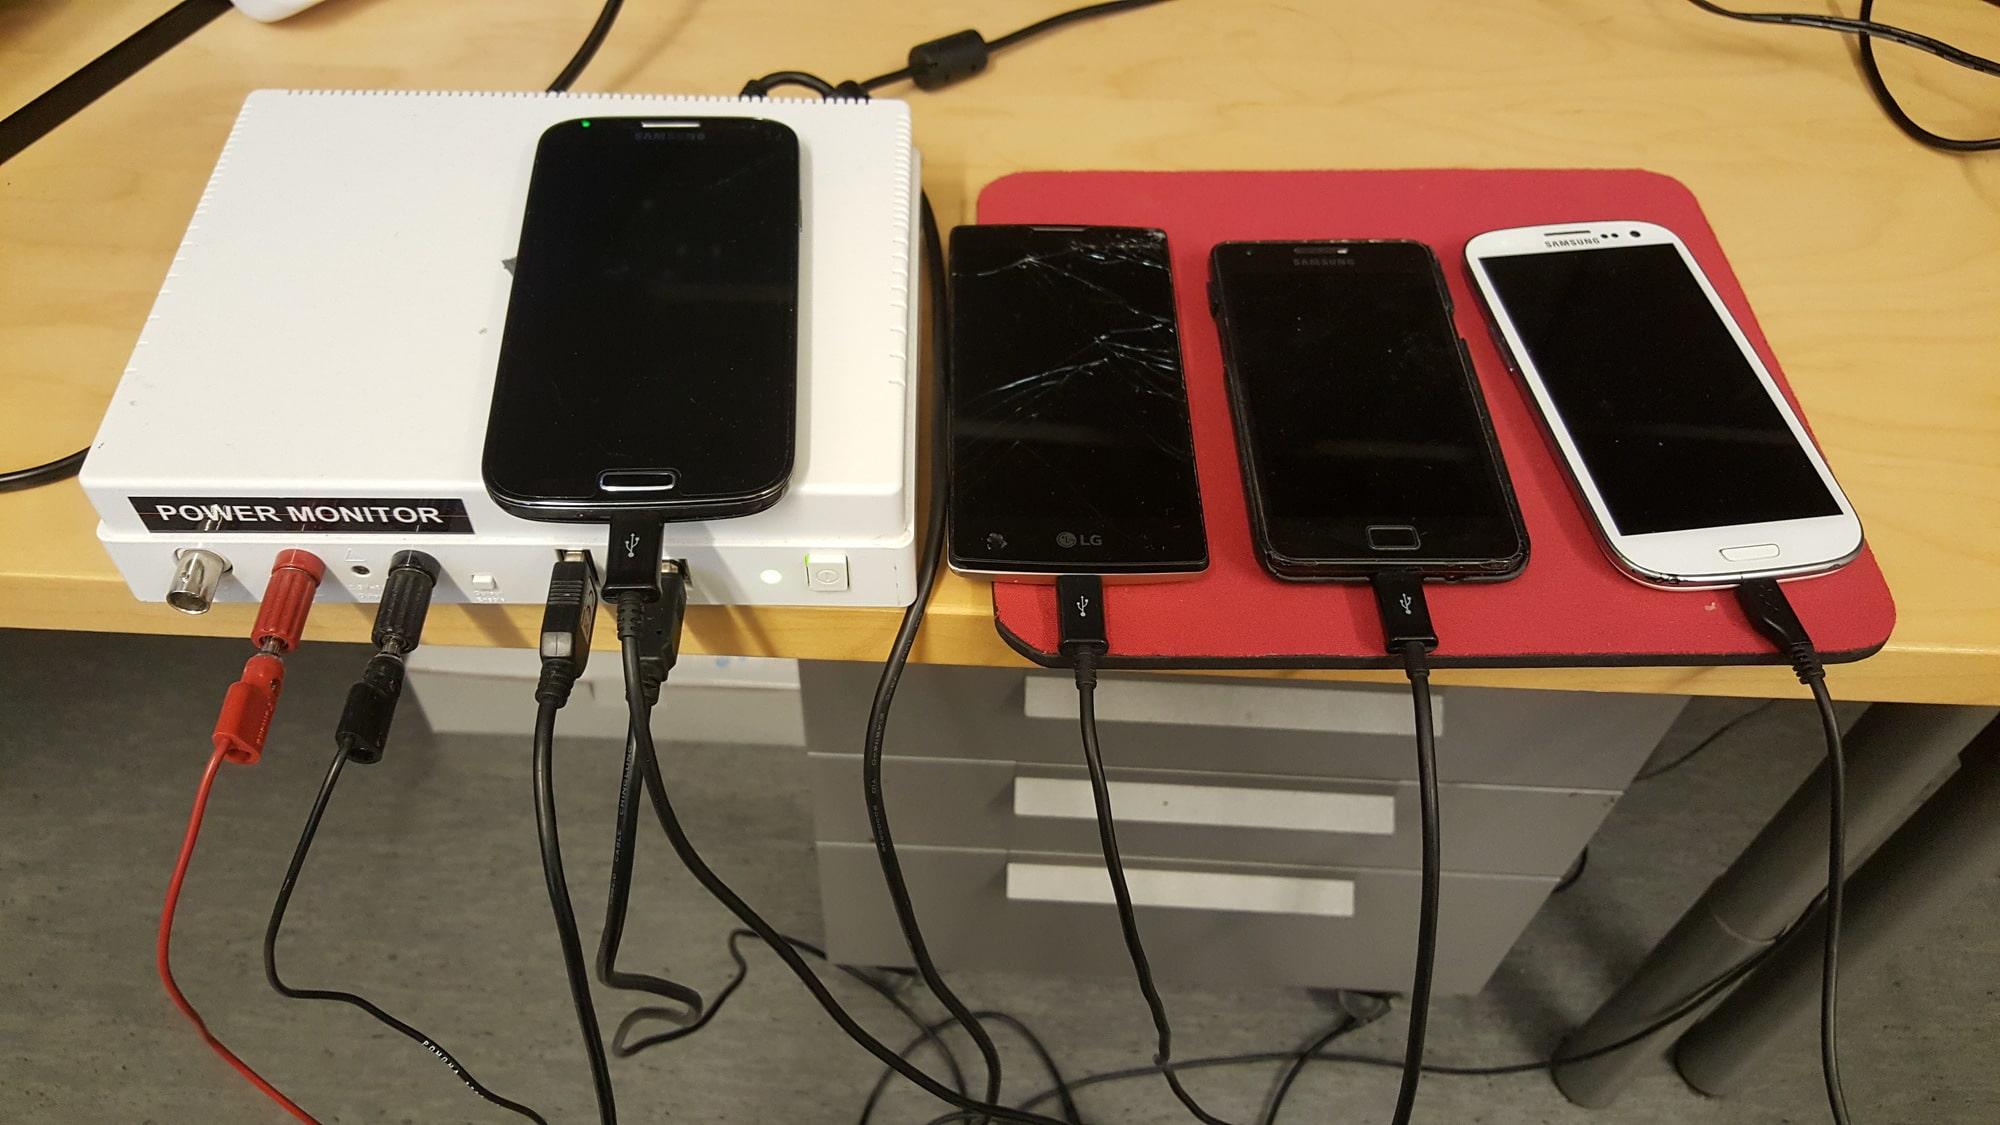 ubispark smartphones data center